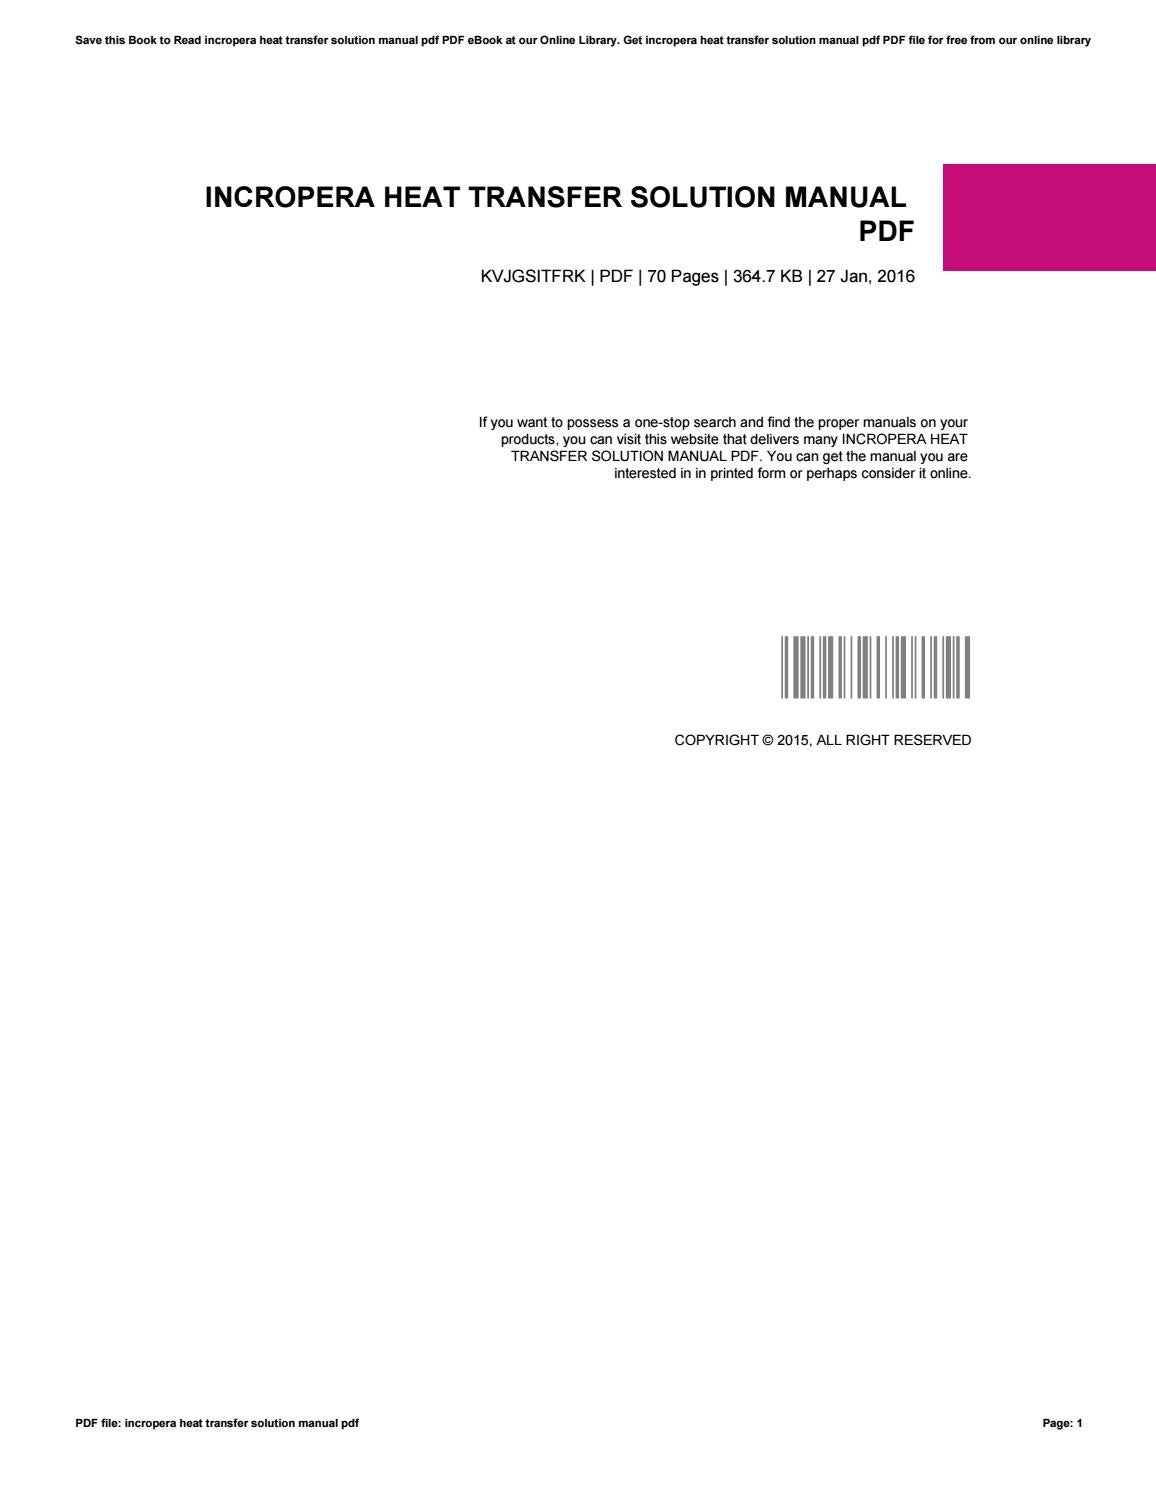 Wrg 6273 Heat Transfer Incropera Solution Manual 2019 Ebook Library